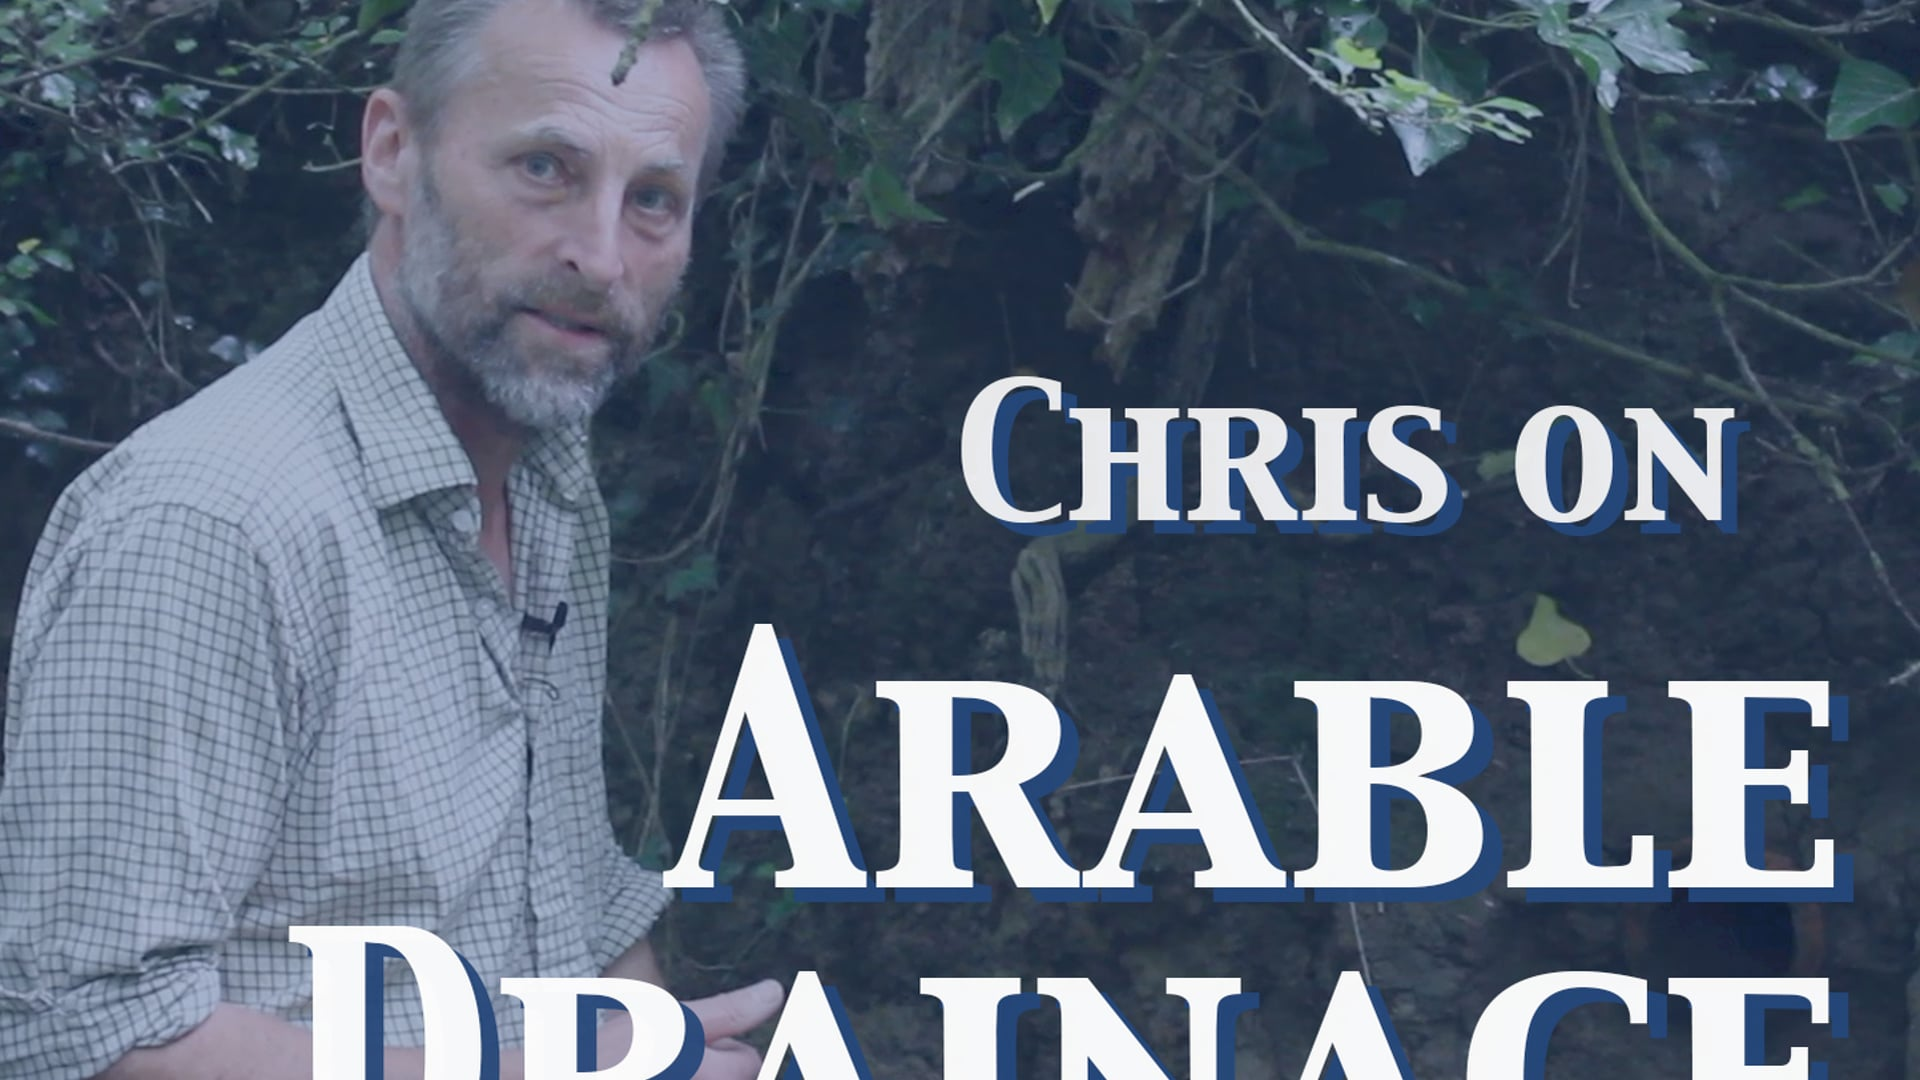 Chris on Arable Drainage